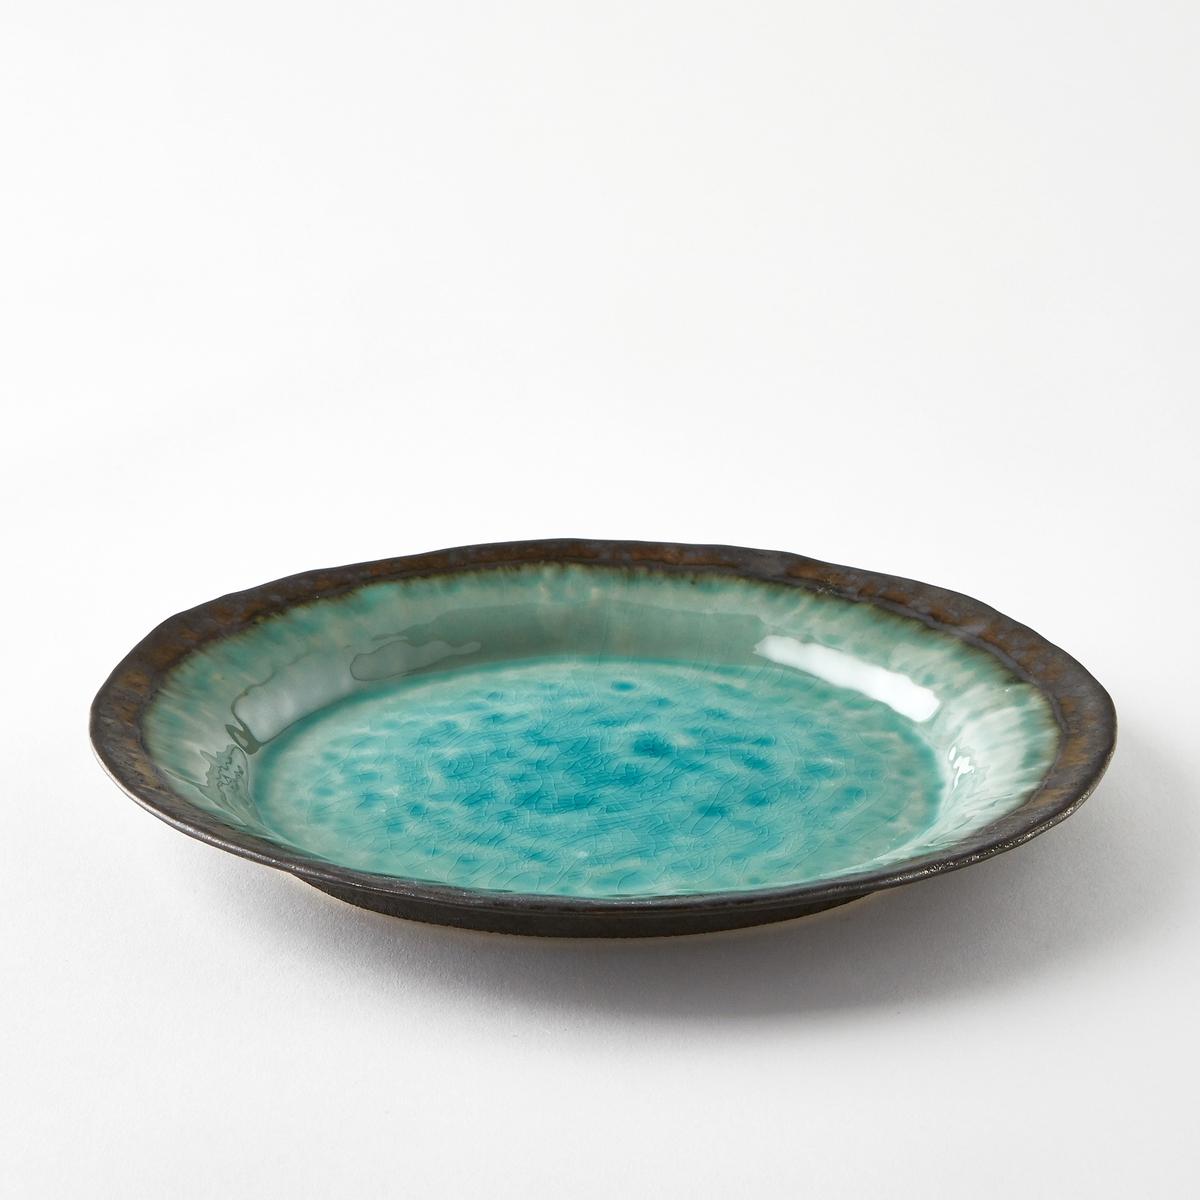 Тарелка La Redoute Мелкая из глазурованной керамики Altadill единый размер синий тарелка мелкая 200 мм priority энчантималс лисенок стекло